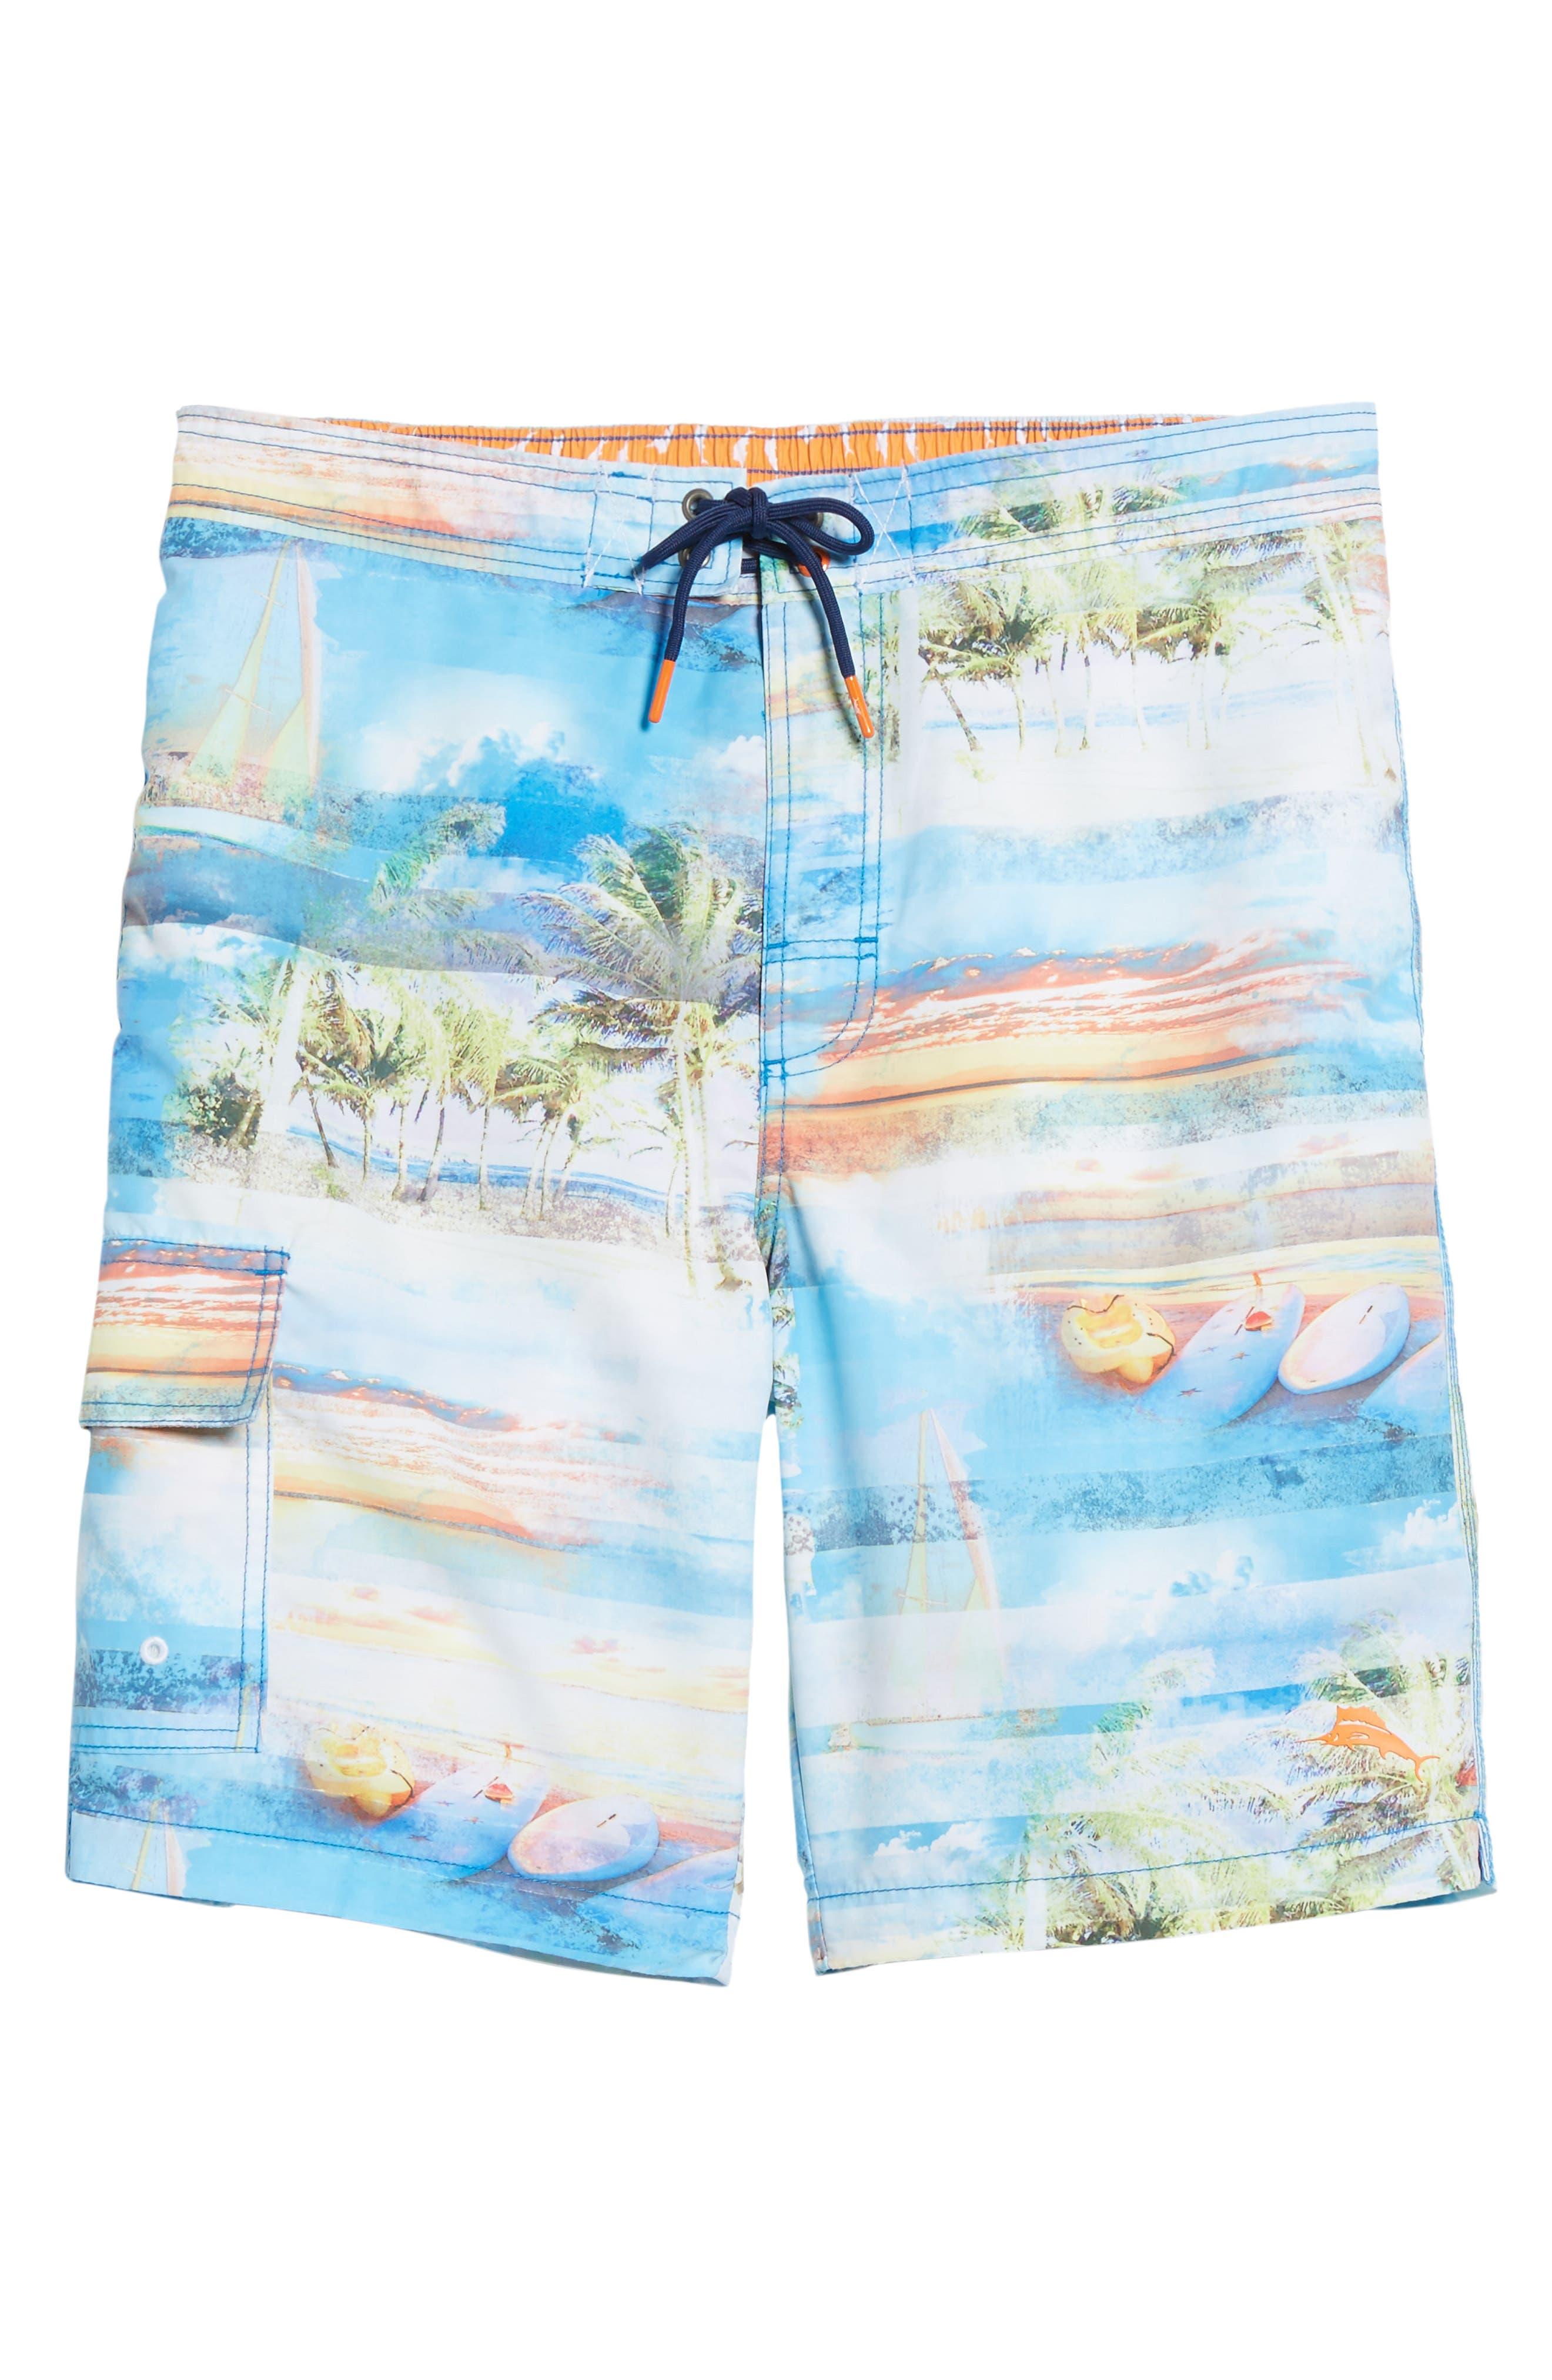 Baja Electric Beach Swim Trunks,                             Alternate thumbnail 6, color,                             Galaxy Blue